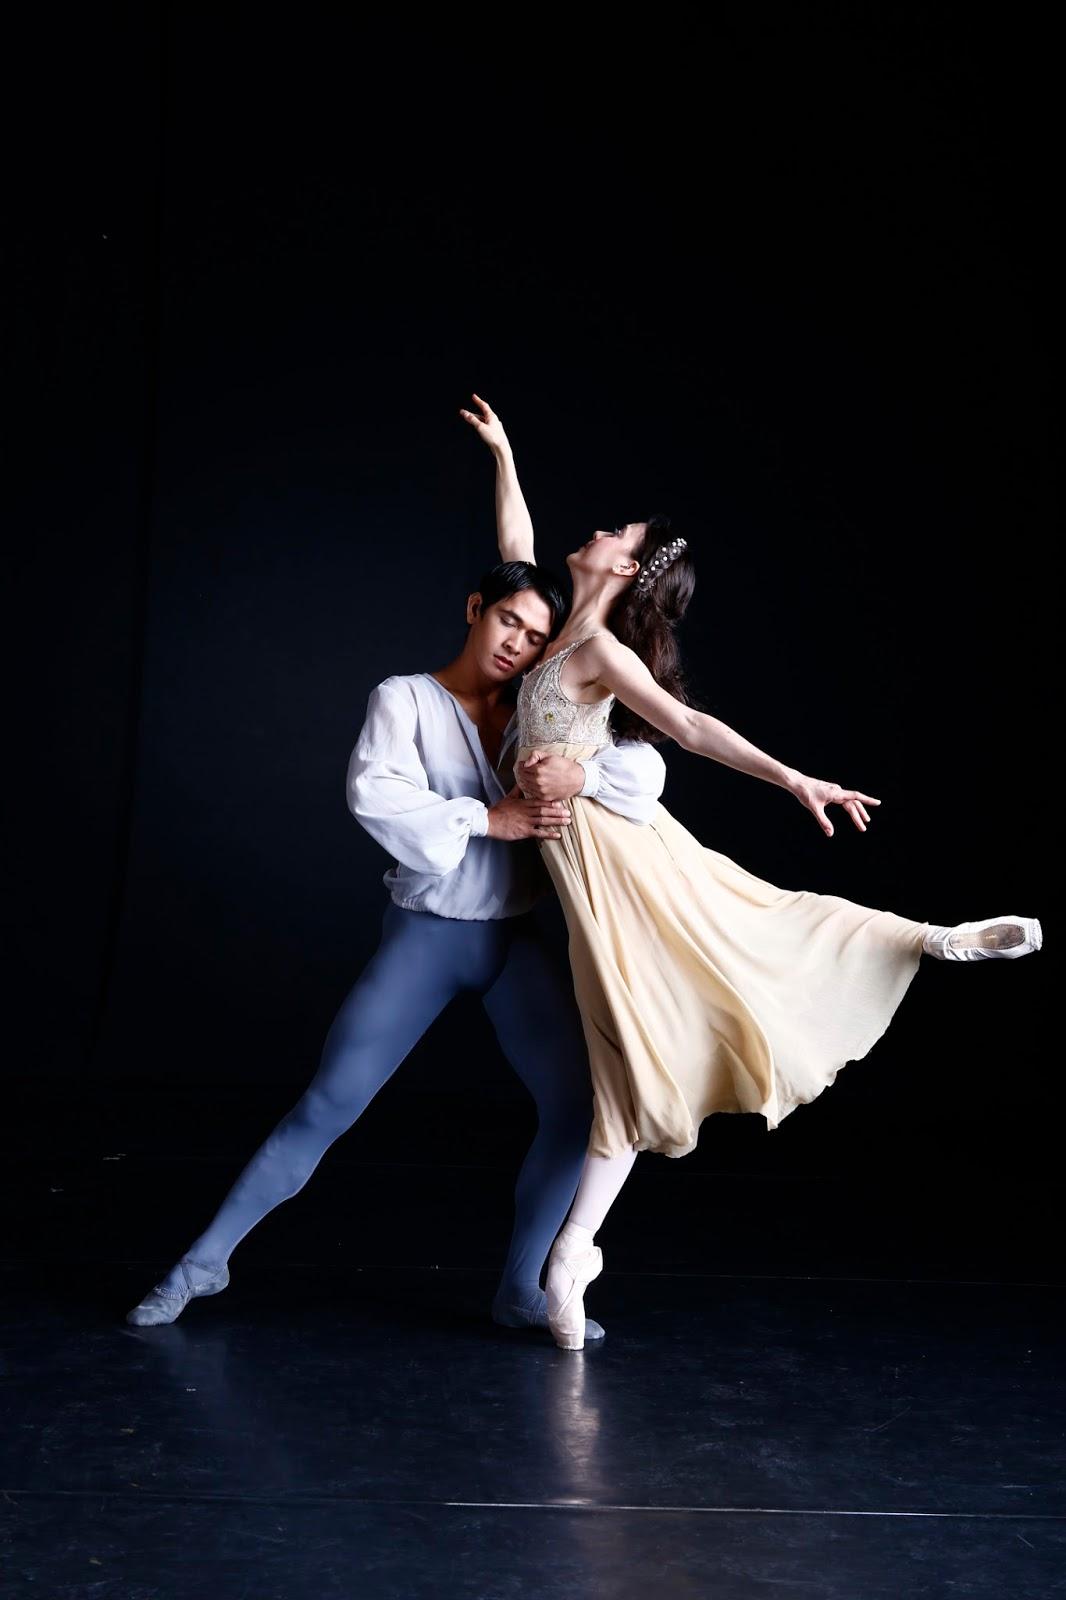 olivia-hussey Romeo and Juliet 1 - XVIDEOSCOM